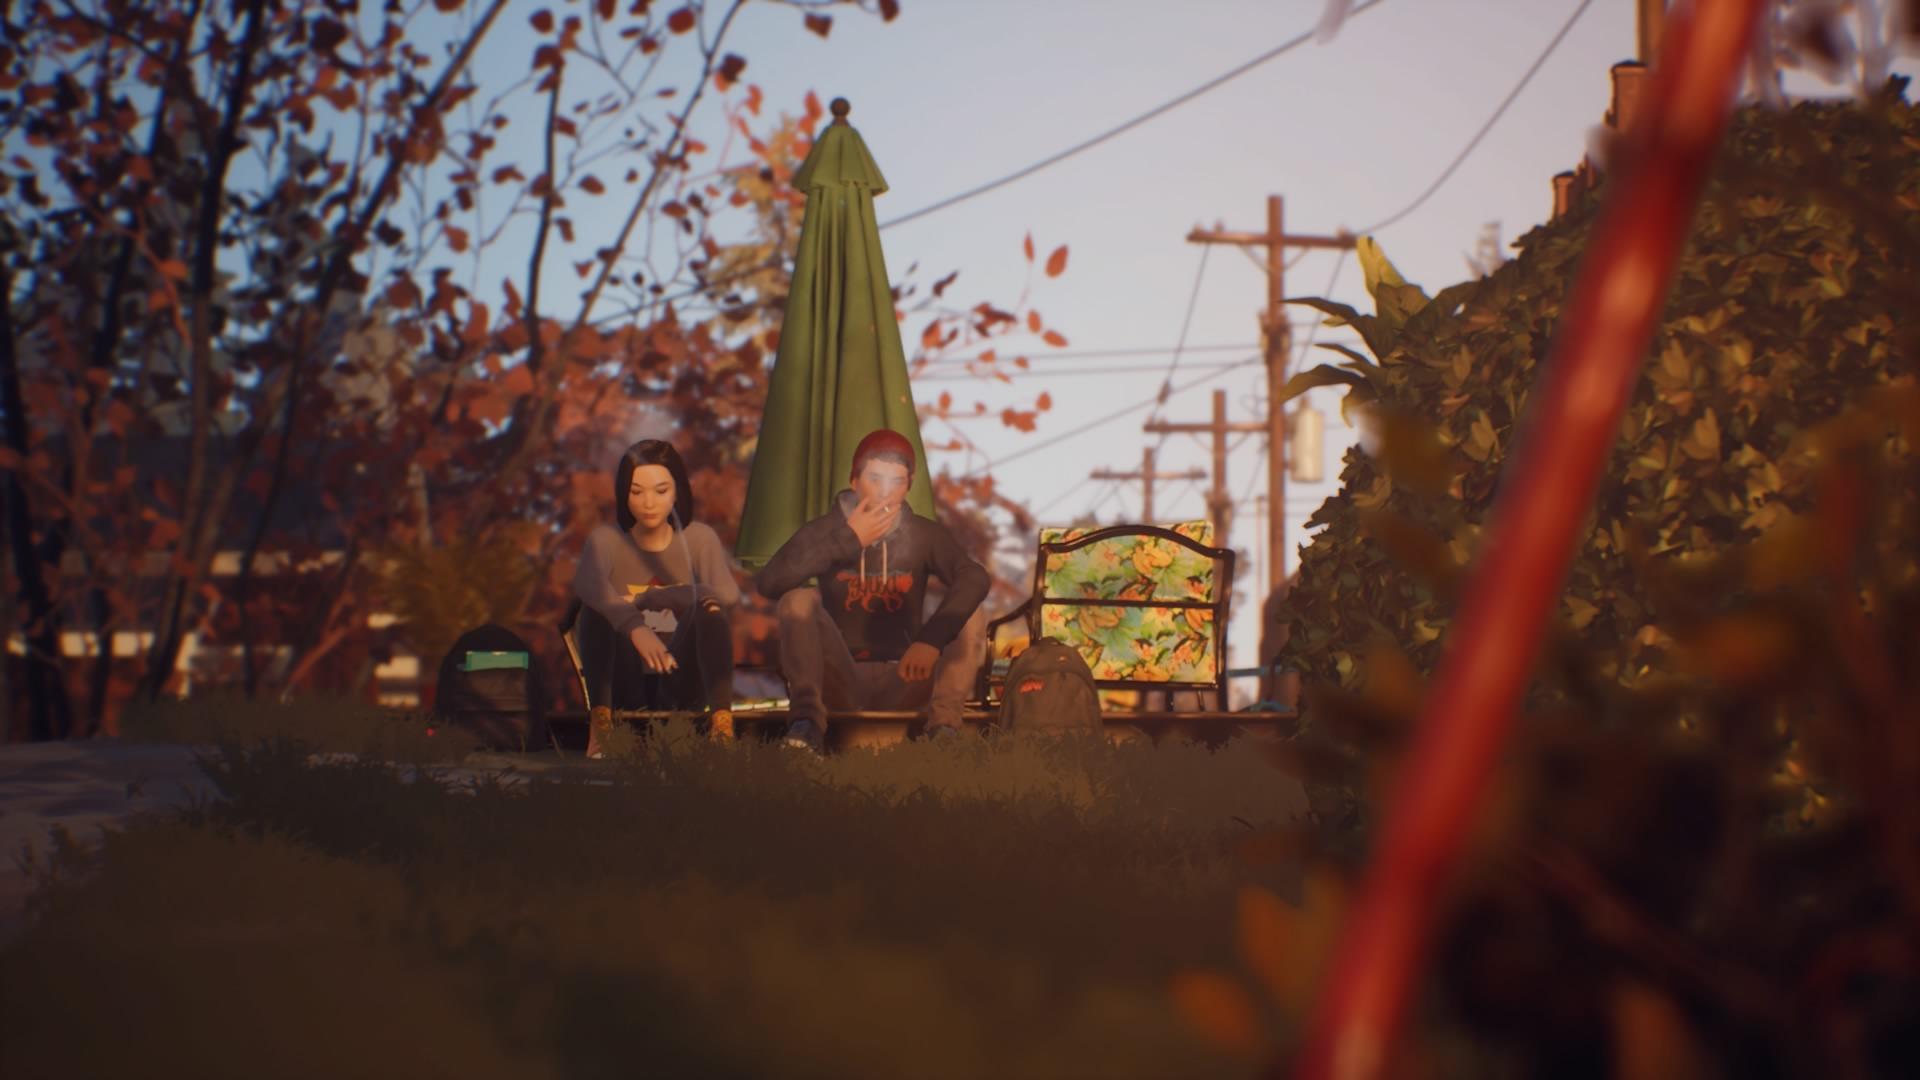 [Análise] Life is Strange 2, Episódio 1: Roads - Vale a Pena? 2